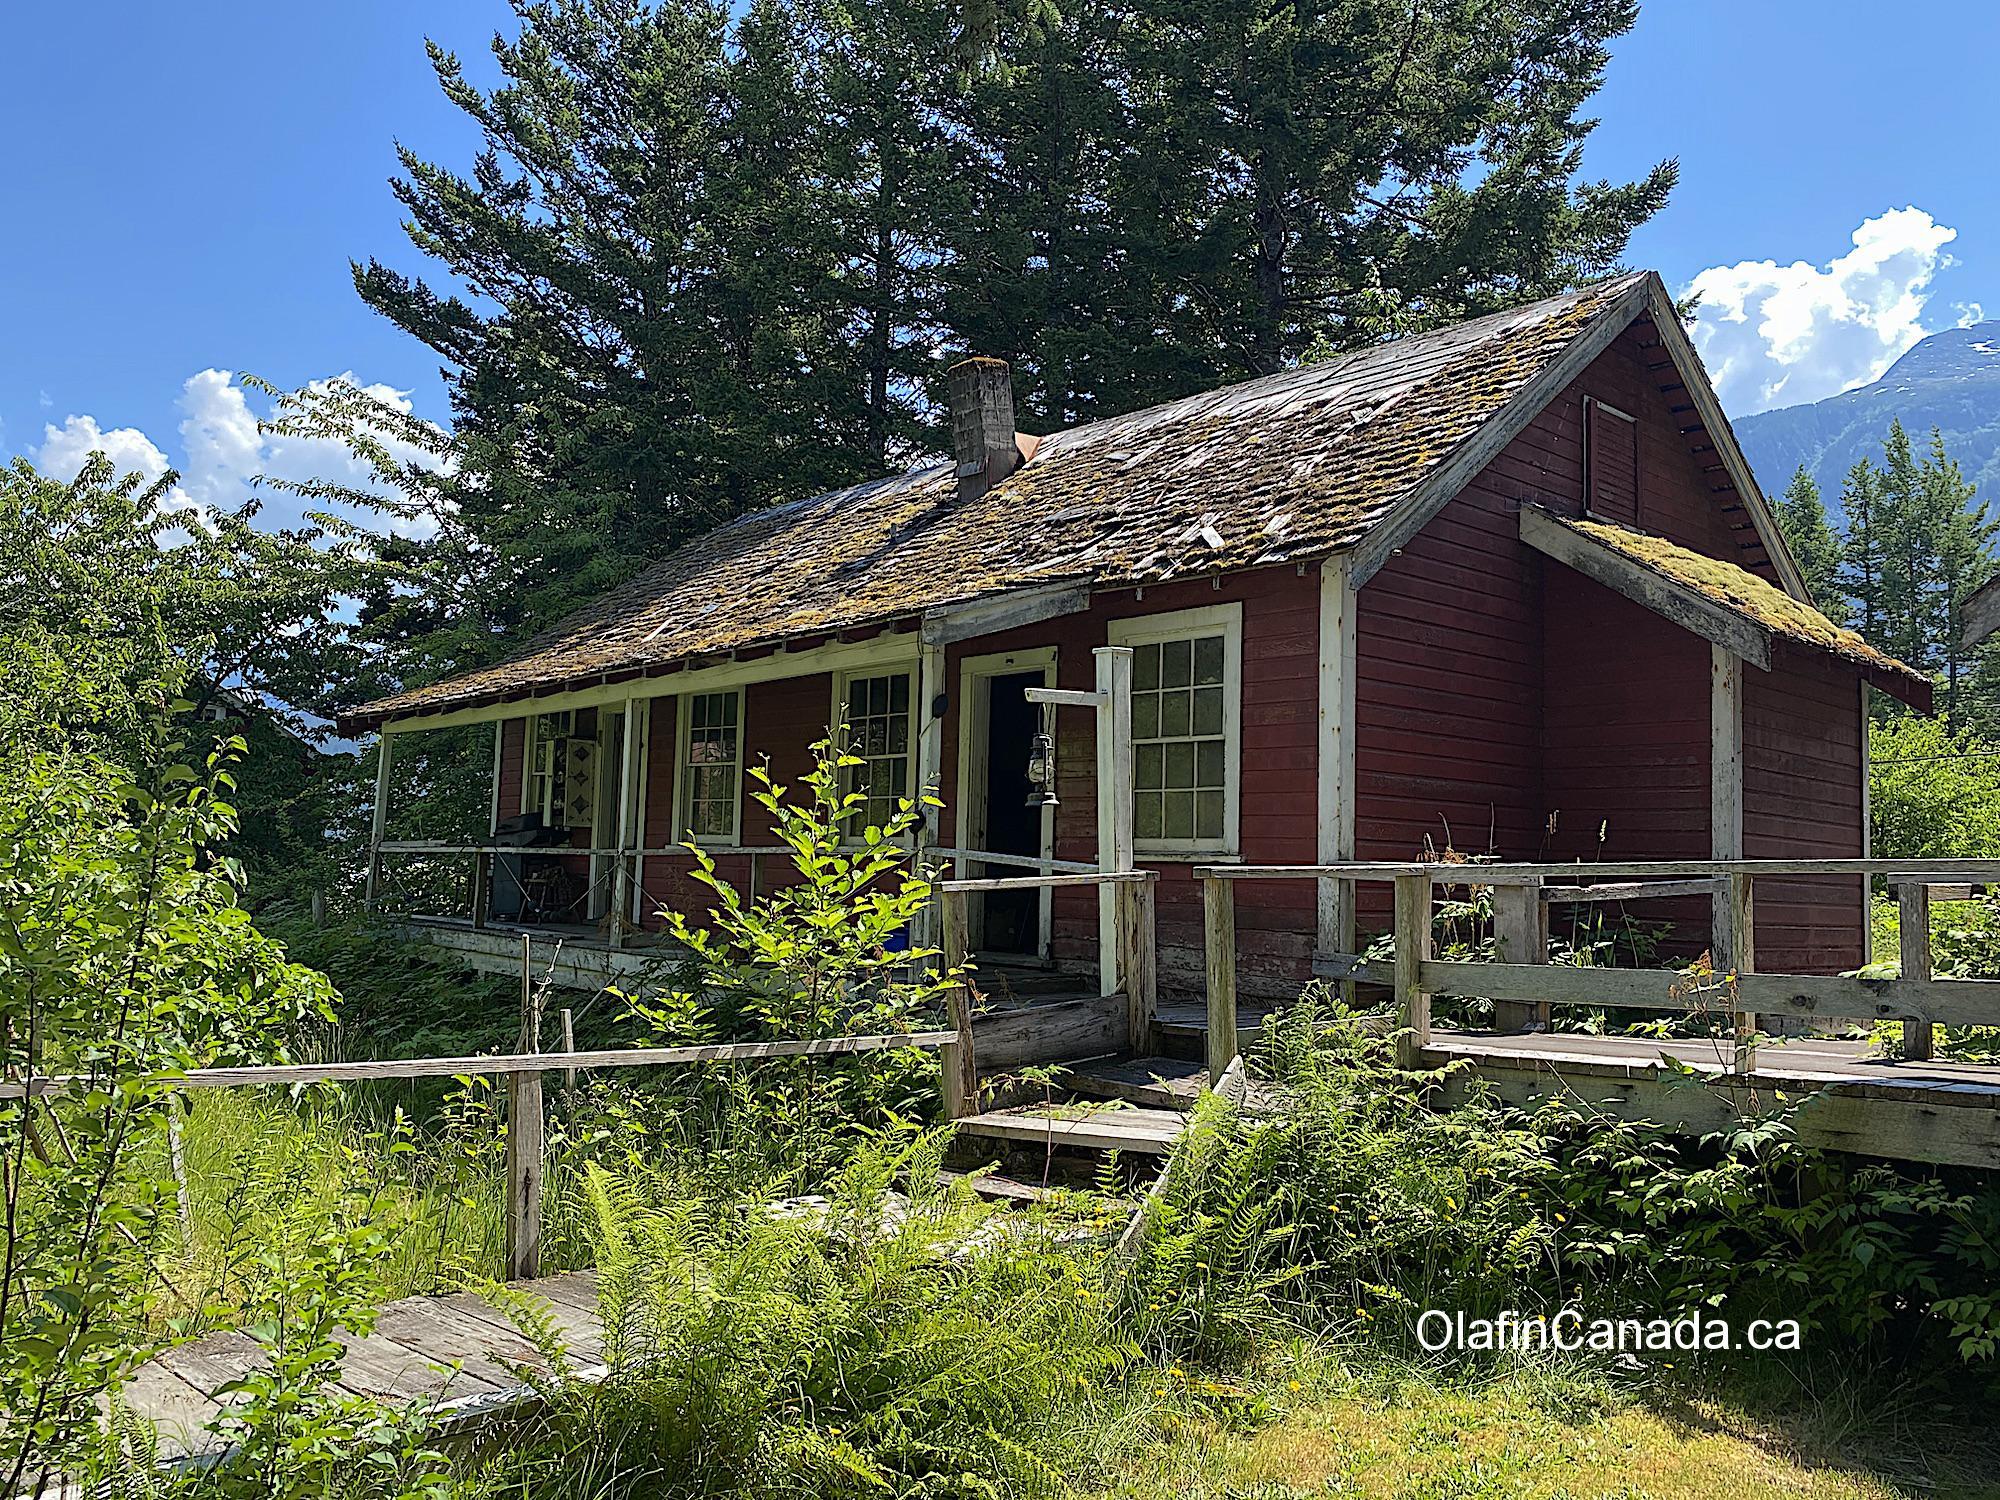 Small employee house at Tallheo Cannery in Bella Coola #olafincanada #britishcolumbia #discoverbc #abandonedbc #tallheocannery #bellacoola